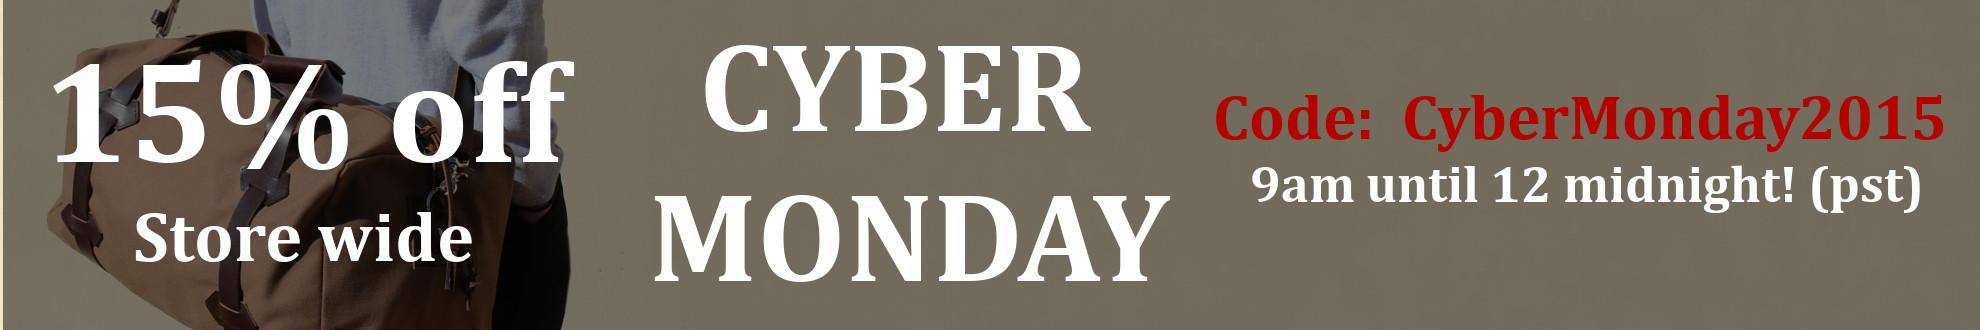 cyber-monday-2015-b.jpg